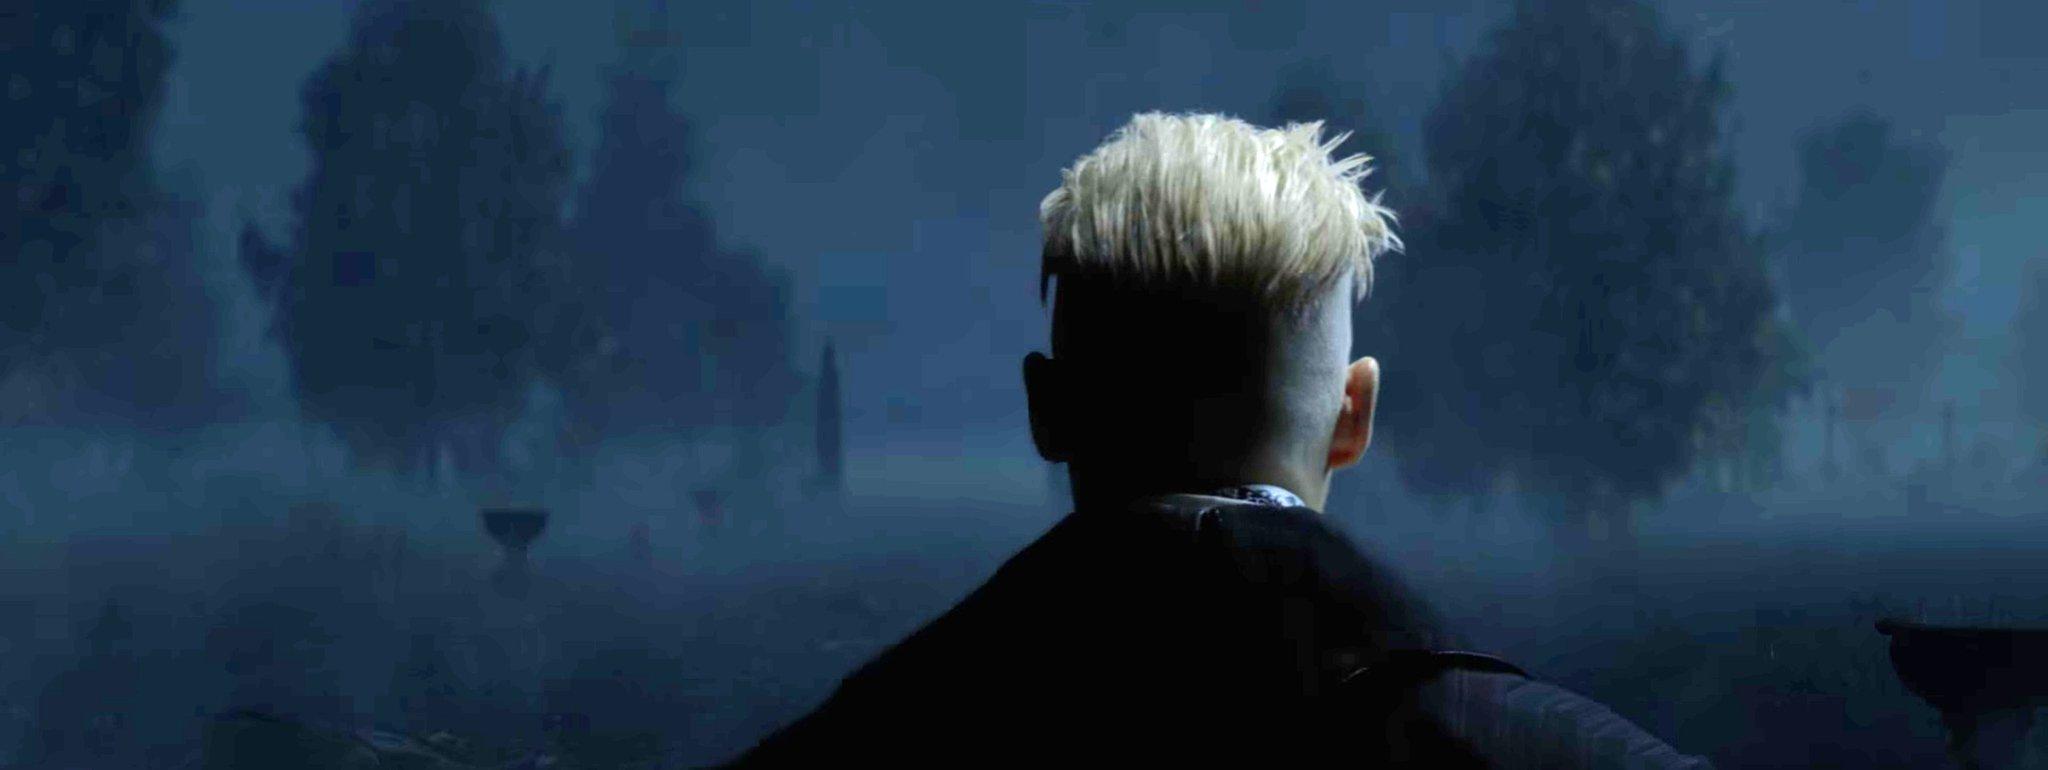 Animaux Fantastiques : Jude Law incarnera Dumbledore sur grand écran ! Par Marine B. Johnny-depp-grindelwald